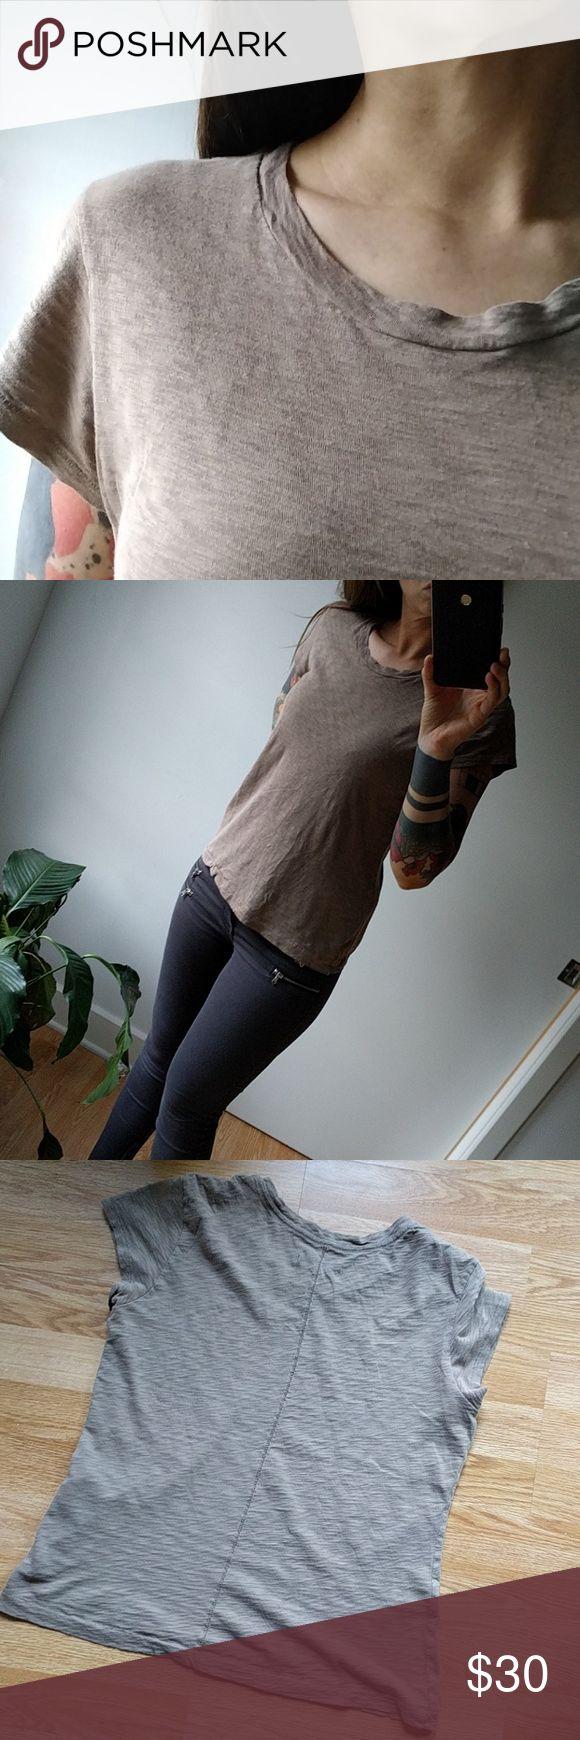 Rag and bone beige tee shirt [Host Pick] Like new, nice fabric with zero signs of wear. rag & bone Tops Tees - Short Sleeve